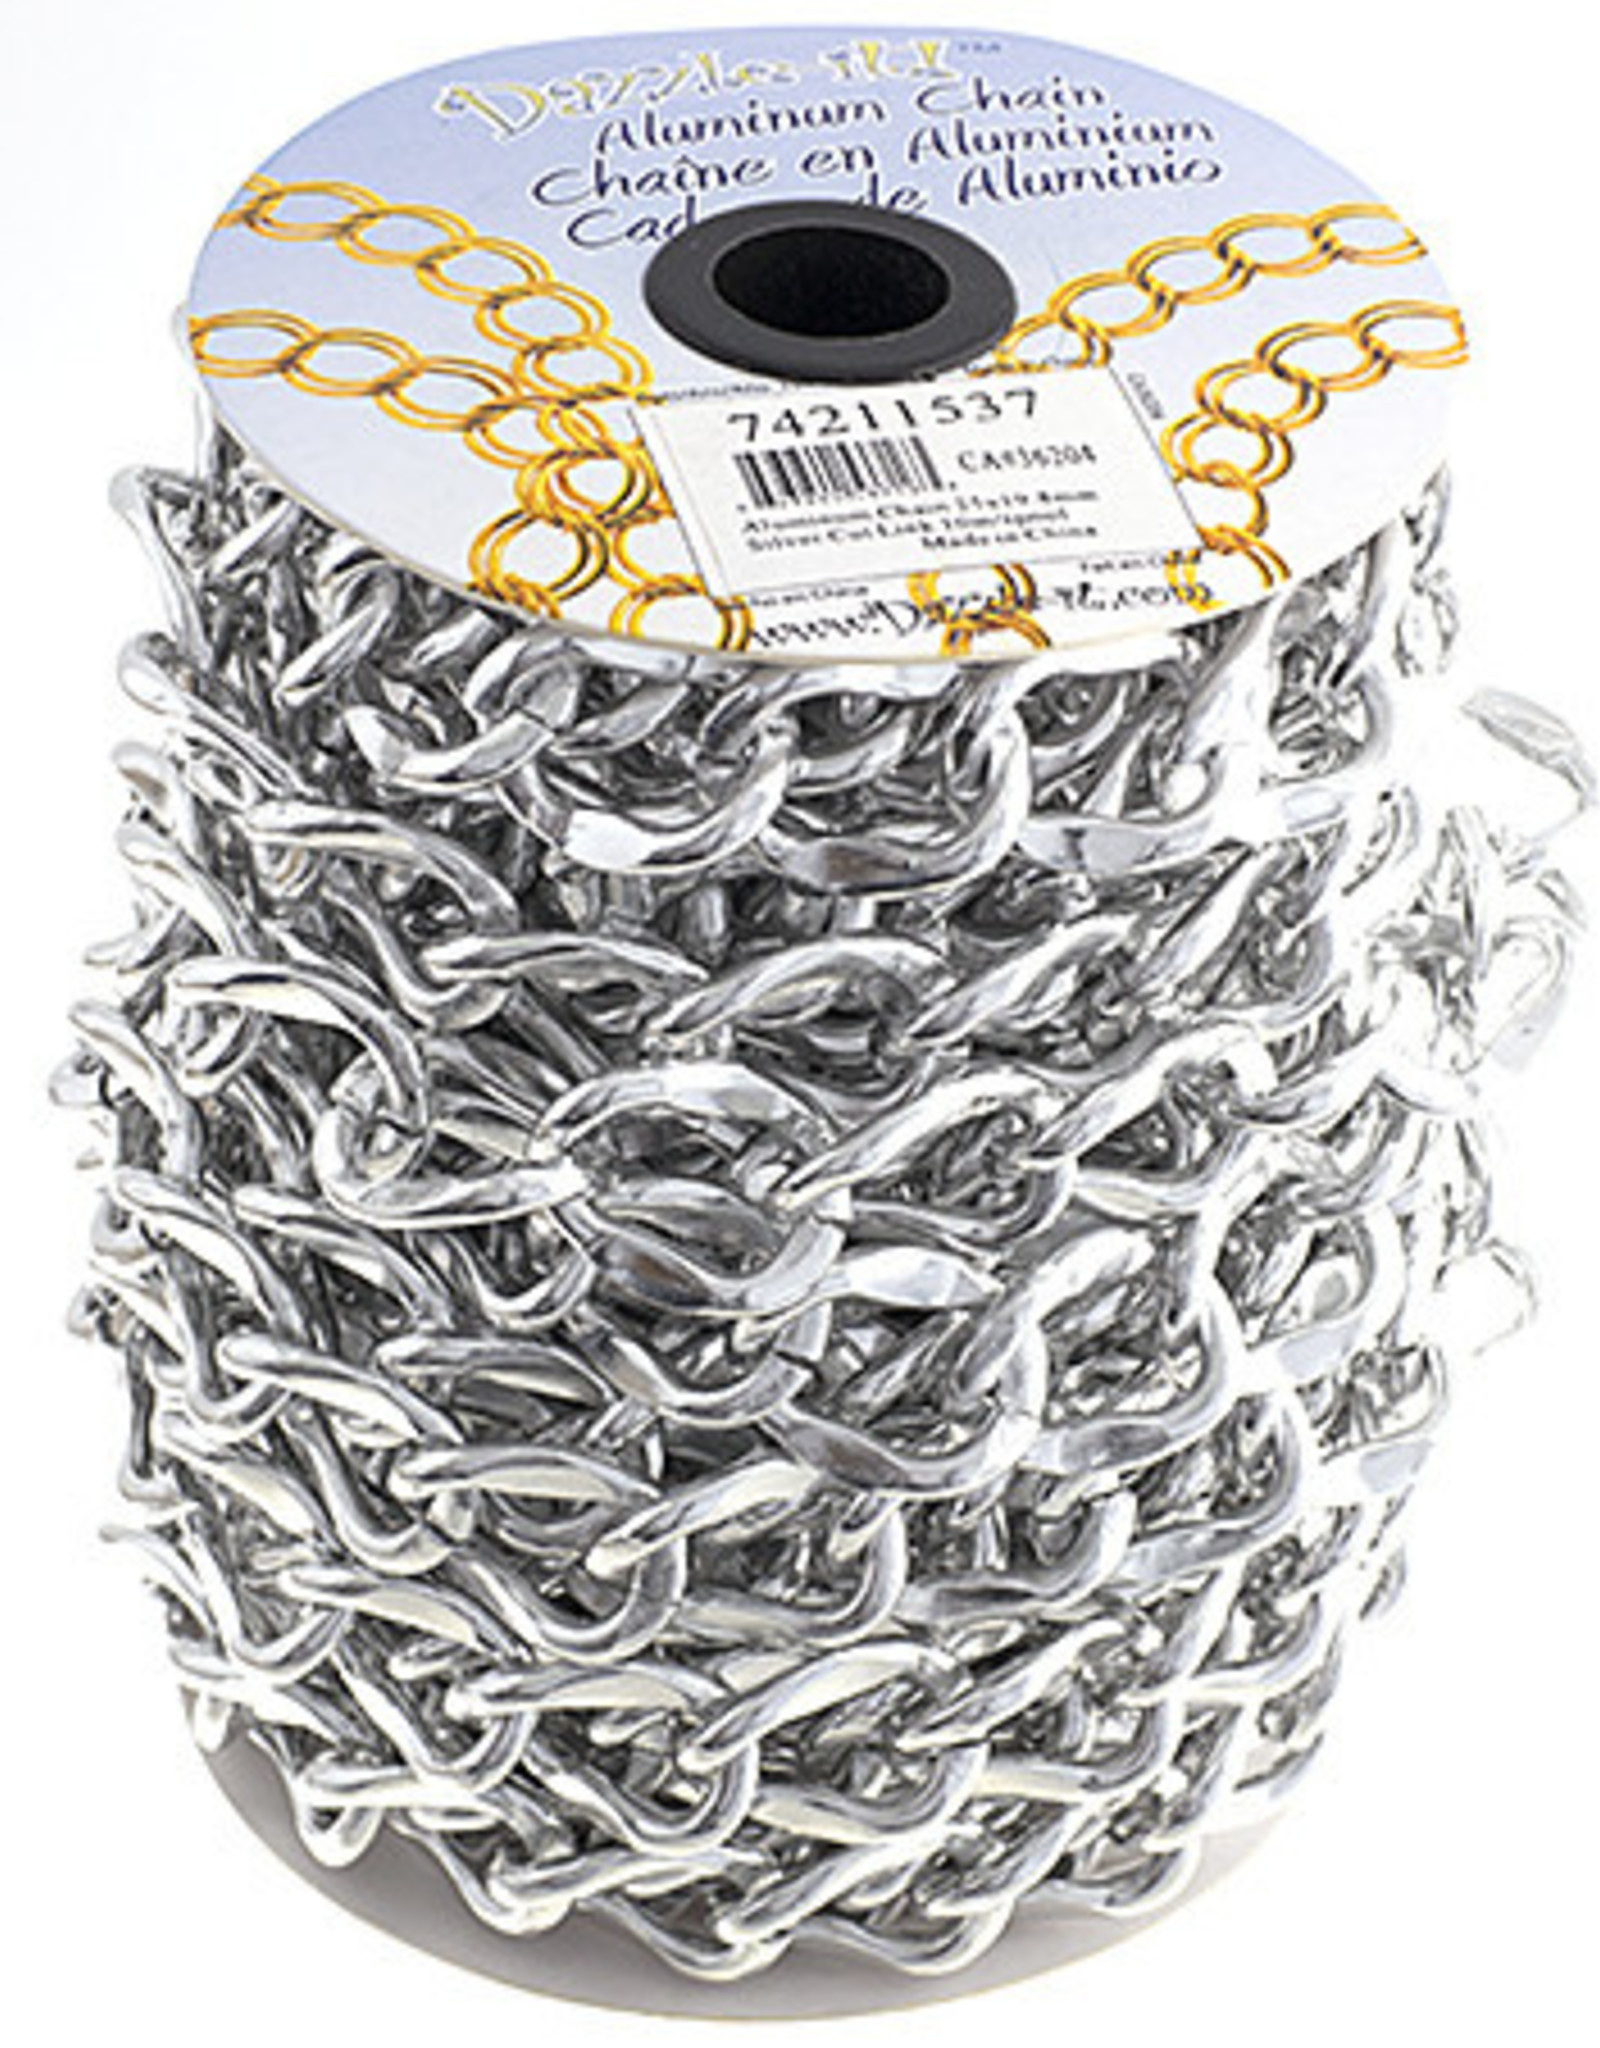 Aluminum Chain 10m/Spool Silver 25 x 19.8mm